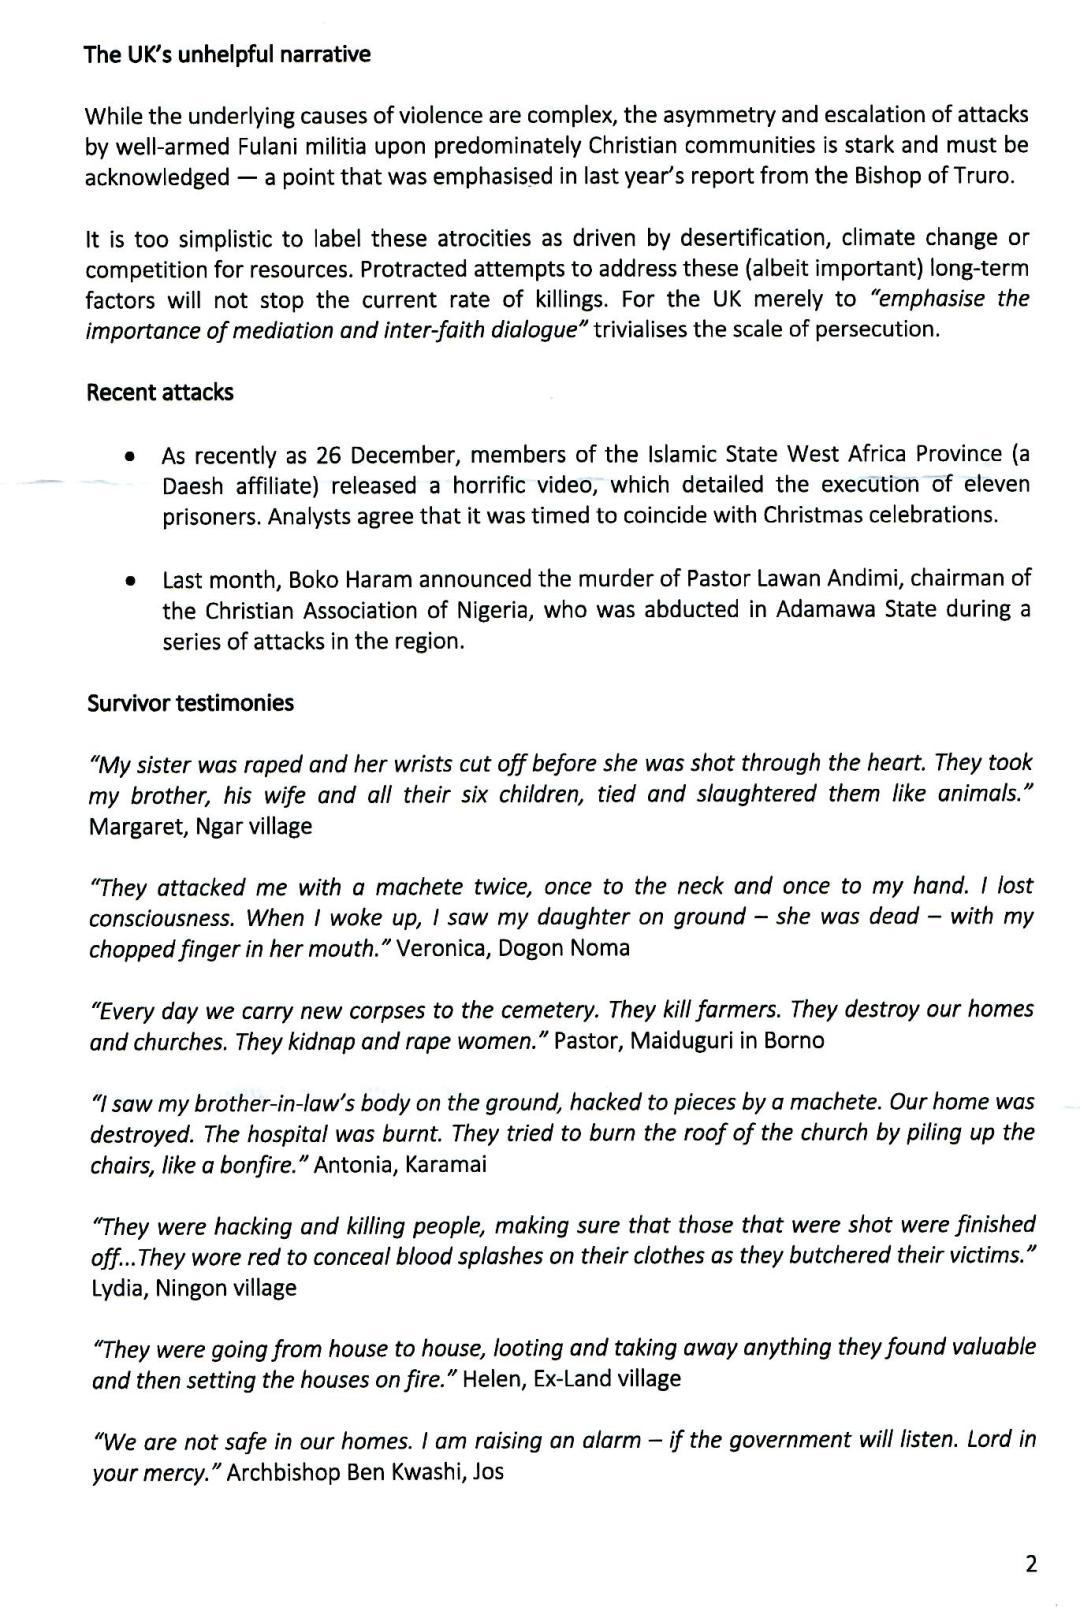 Baroness Cox Report on Nigeria